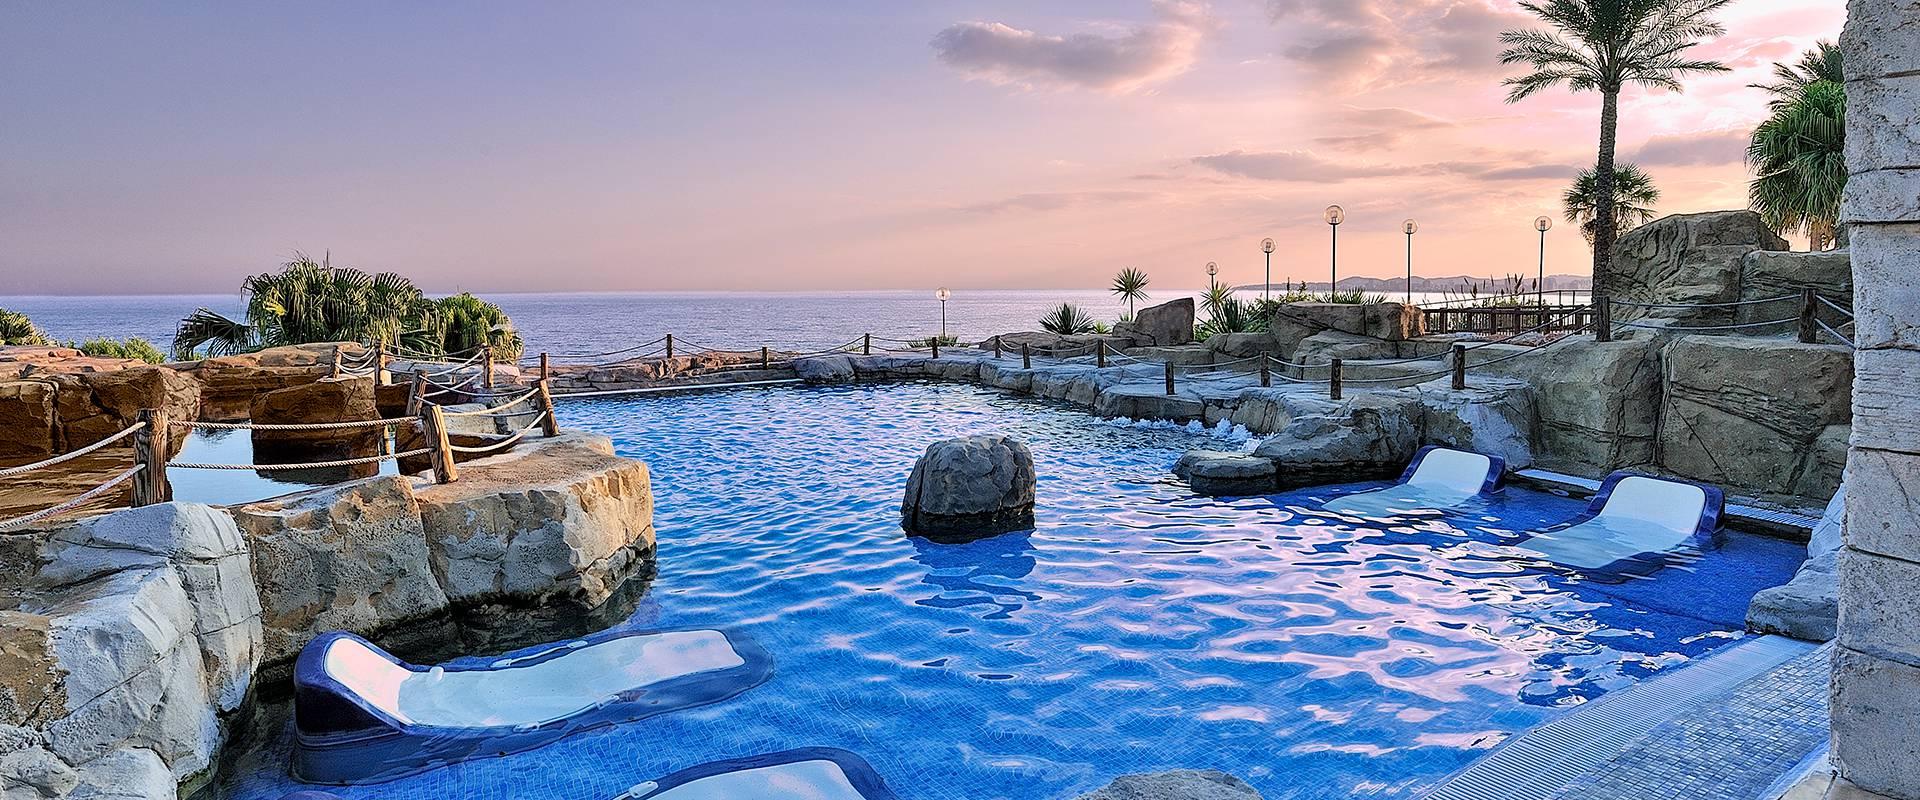 Zona relax beach club de Hotel Holiday World